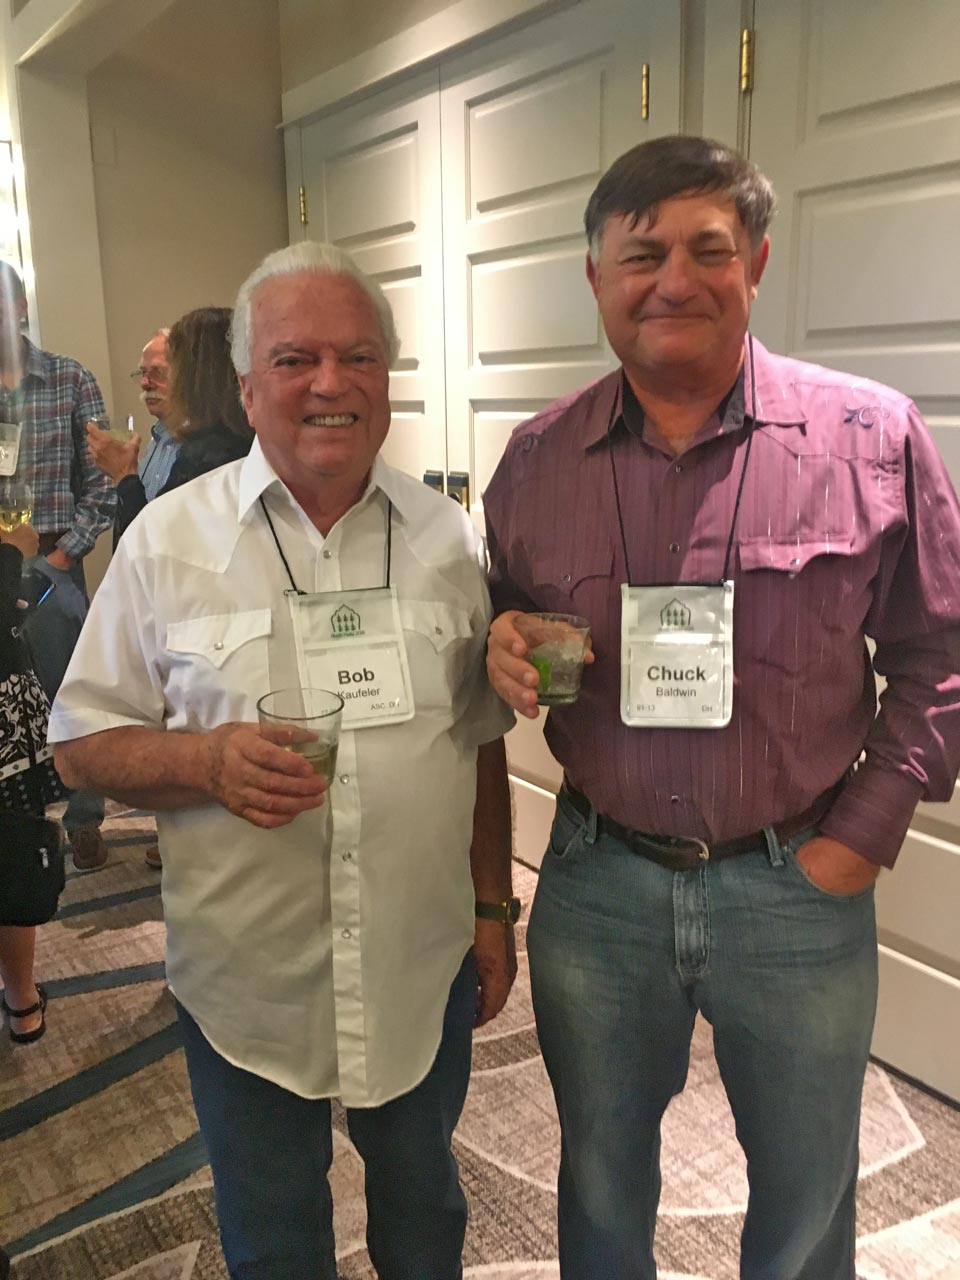 Bob Kaufeler with Chuck Baldwin